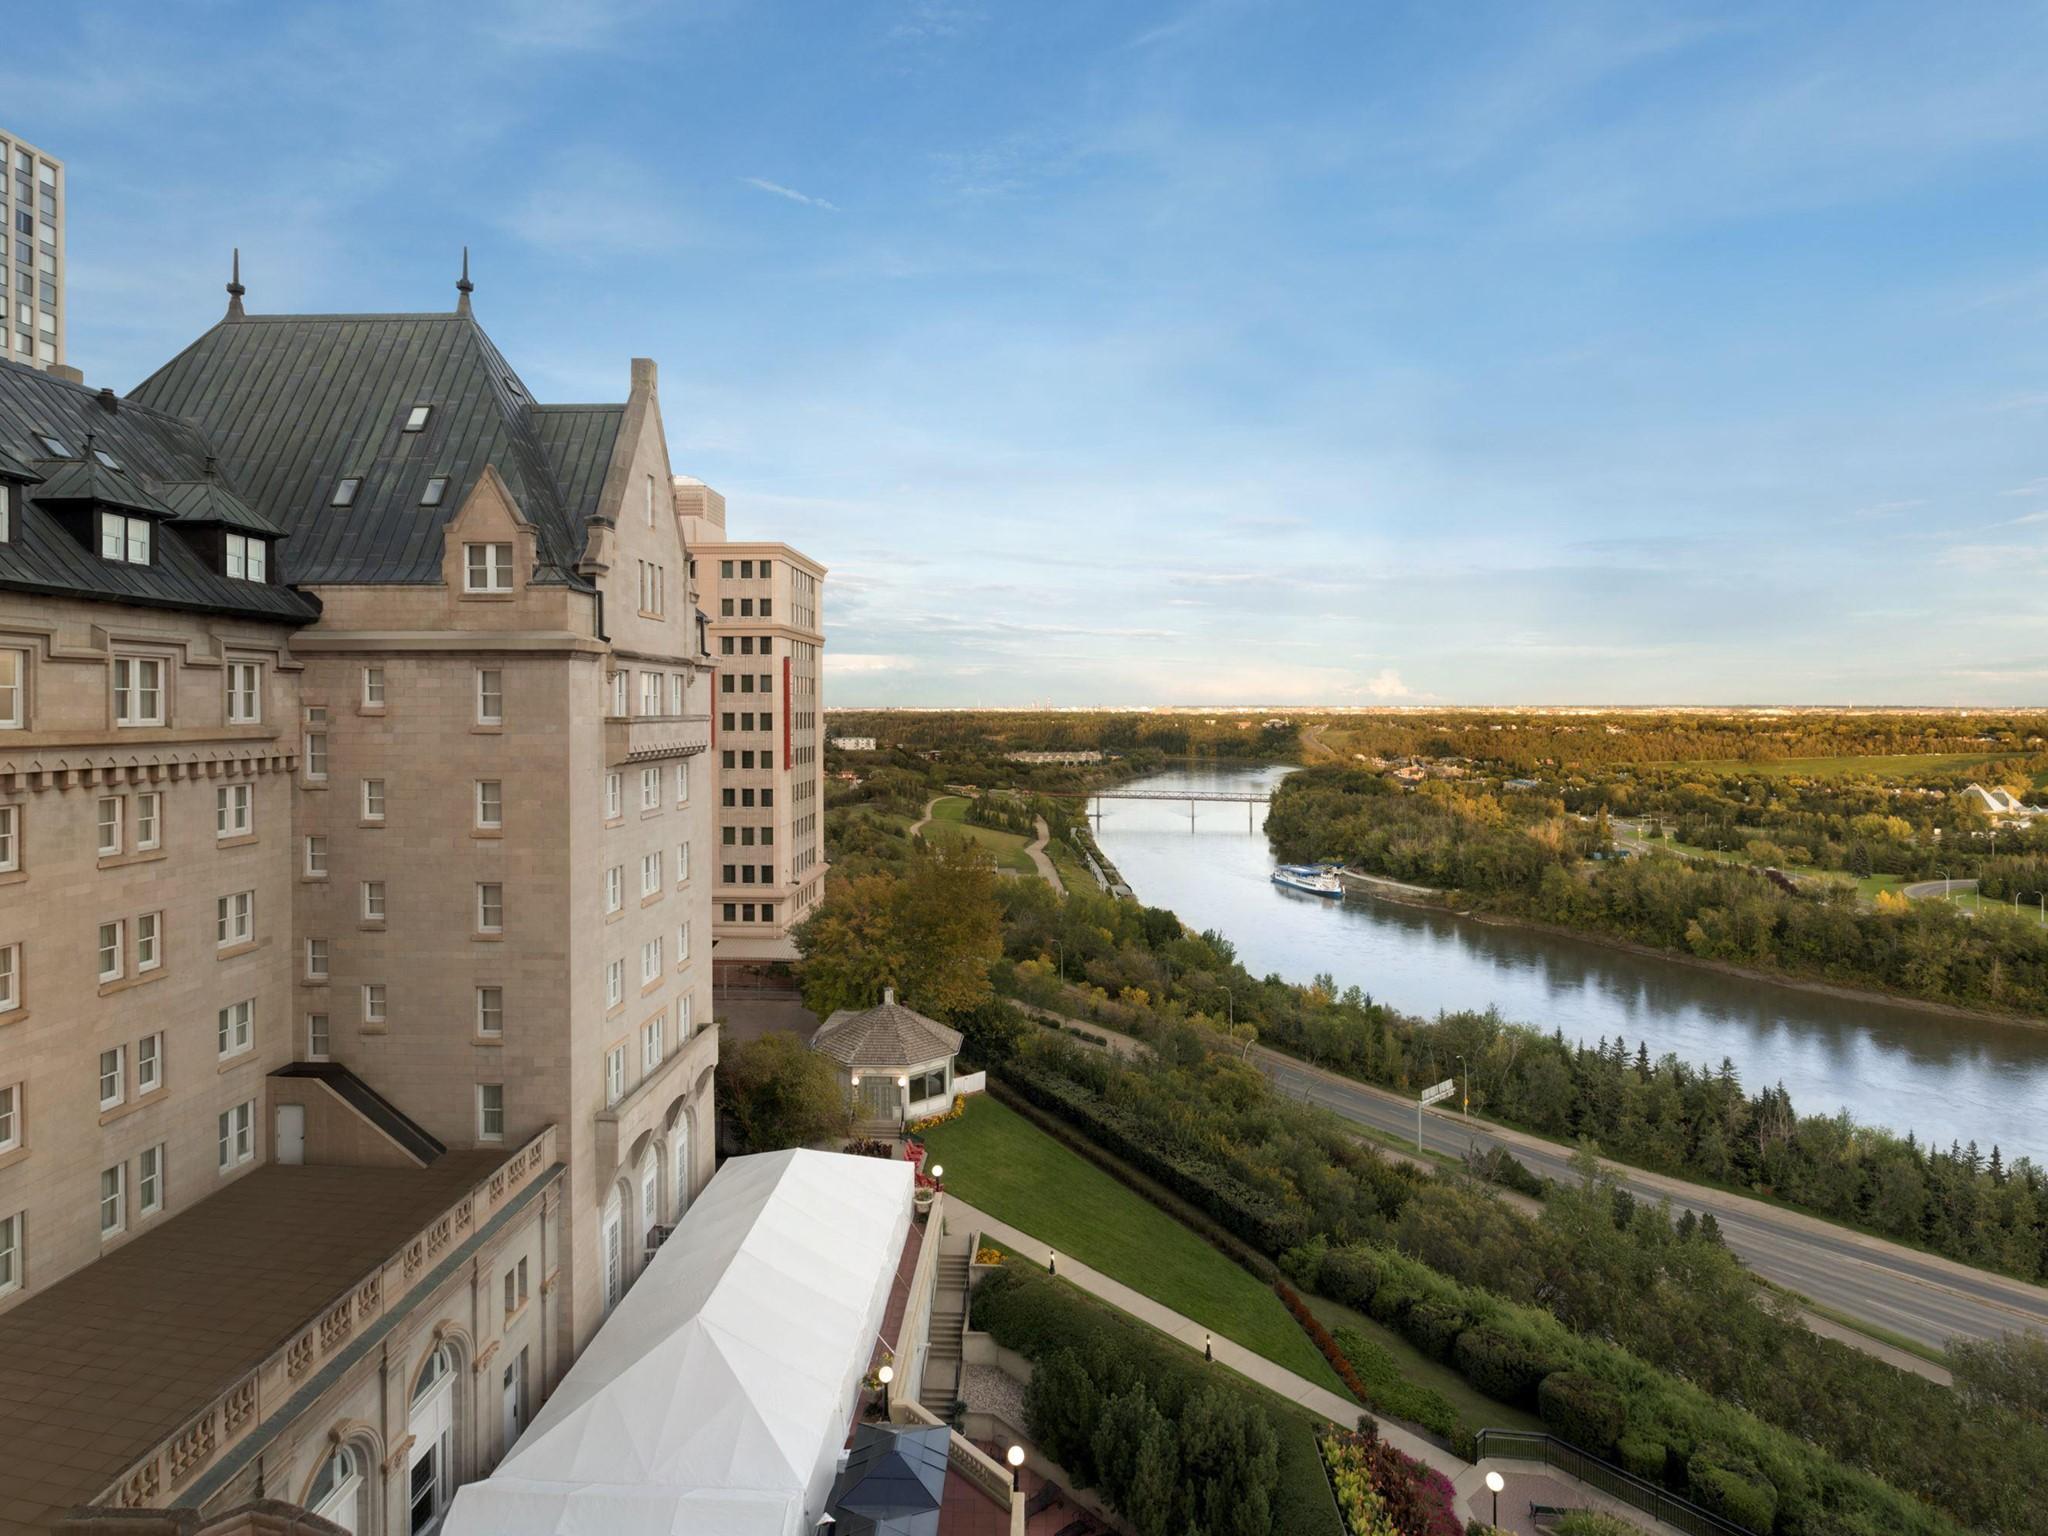 Otel – Fairmont Hotel Macdonald